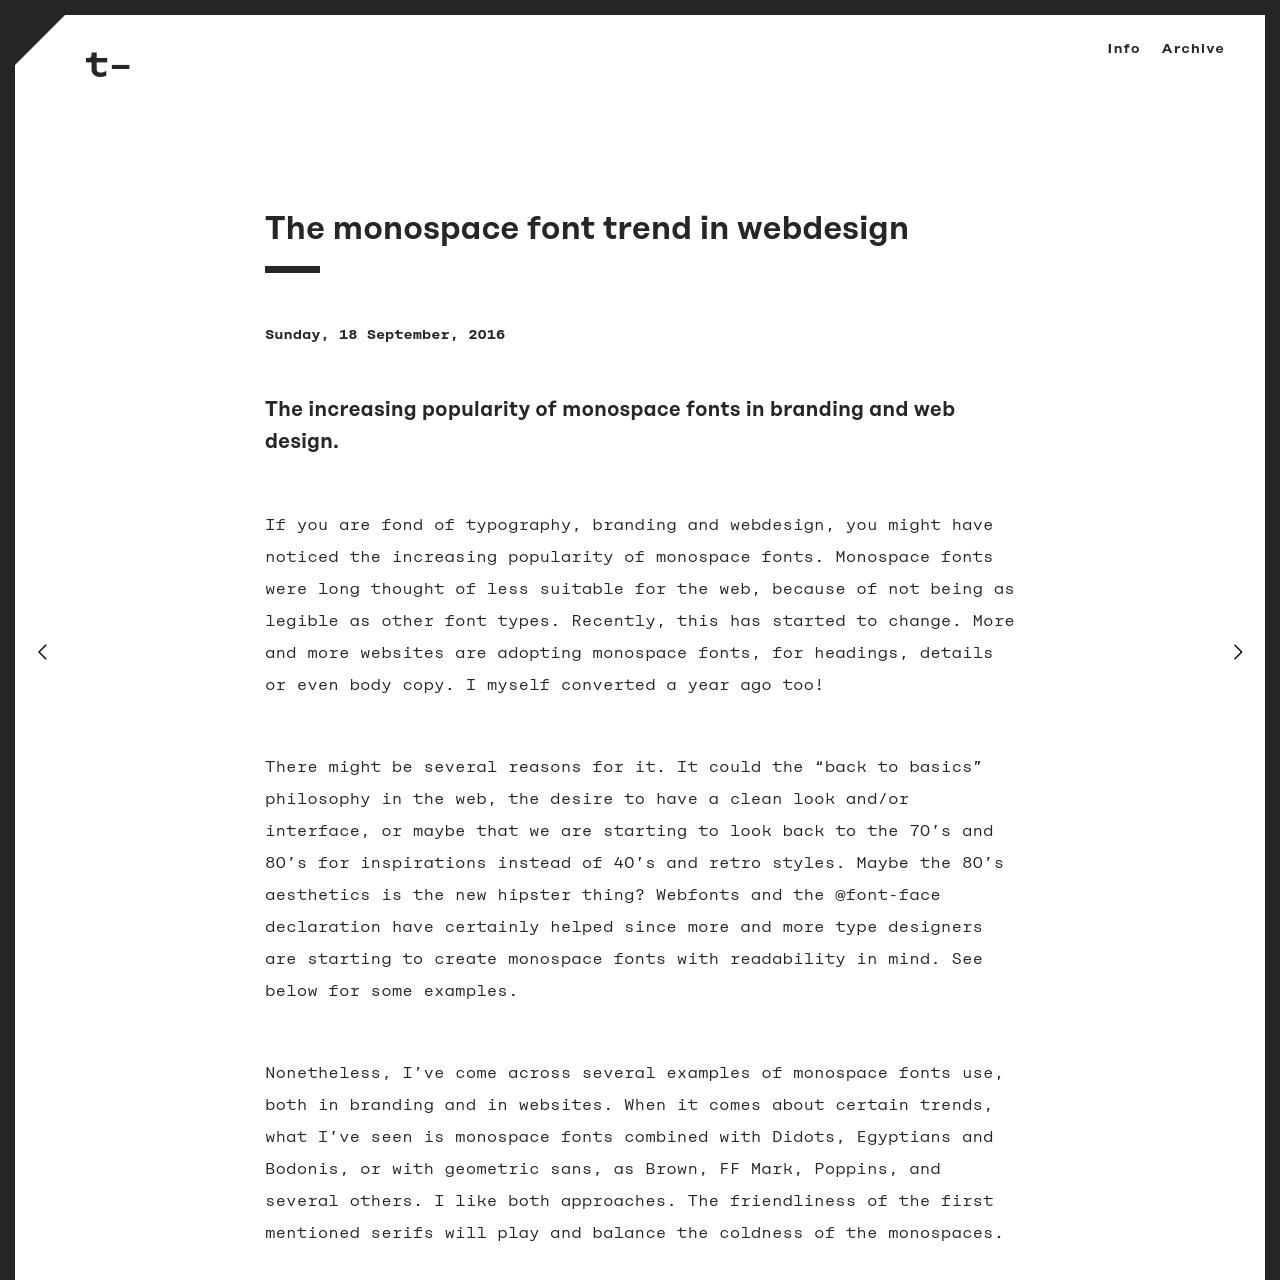 Are na / The monospace font trend in webdesign - t y p e c o d e